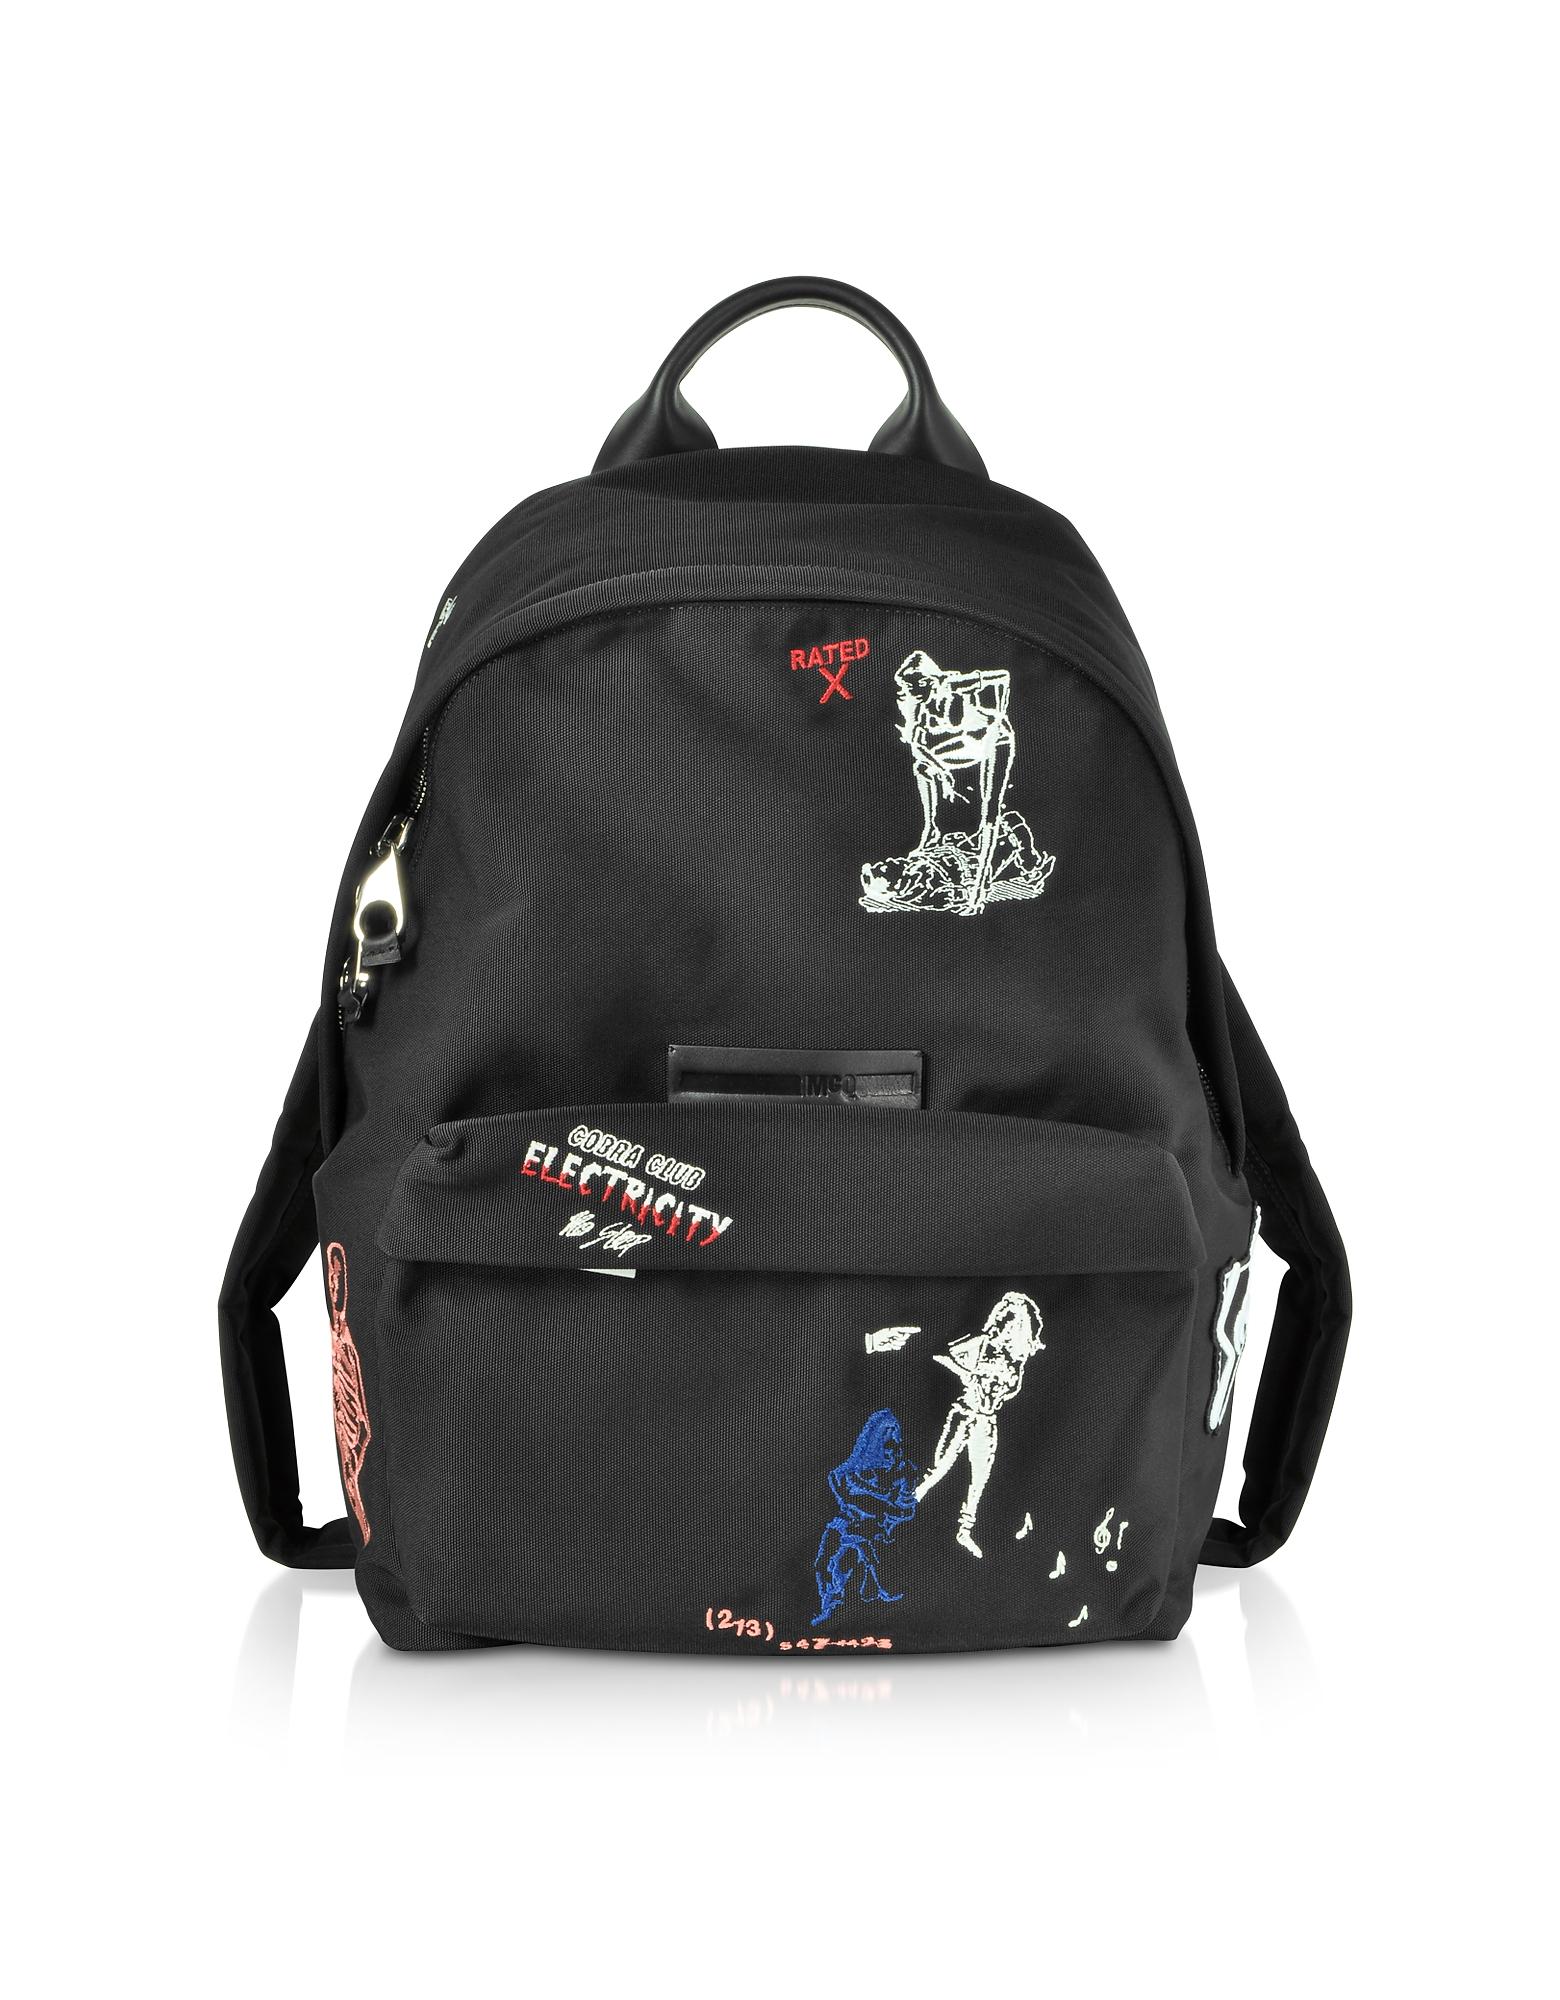 Black Embroidered Nylon Backpack